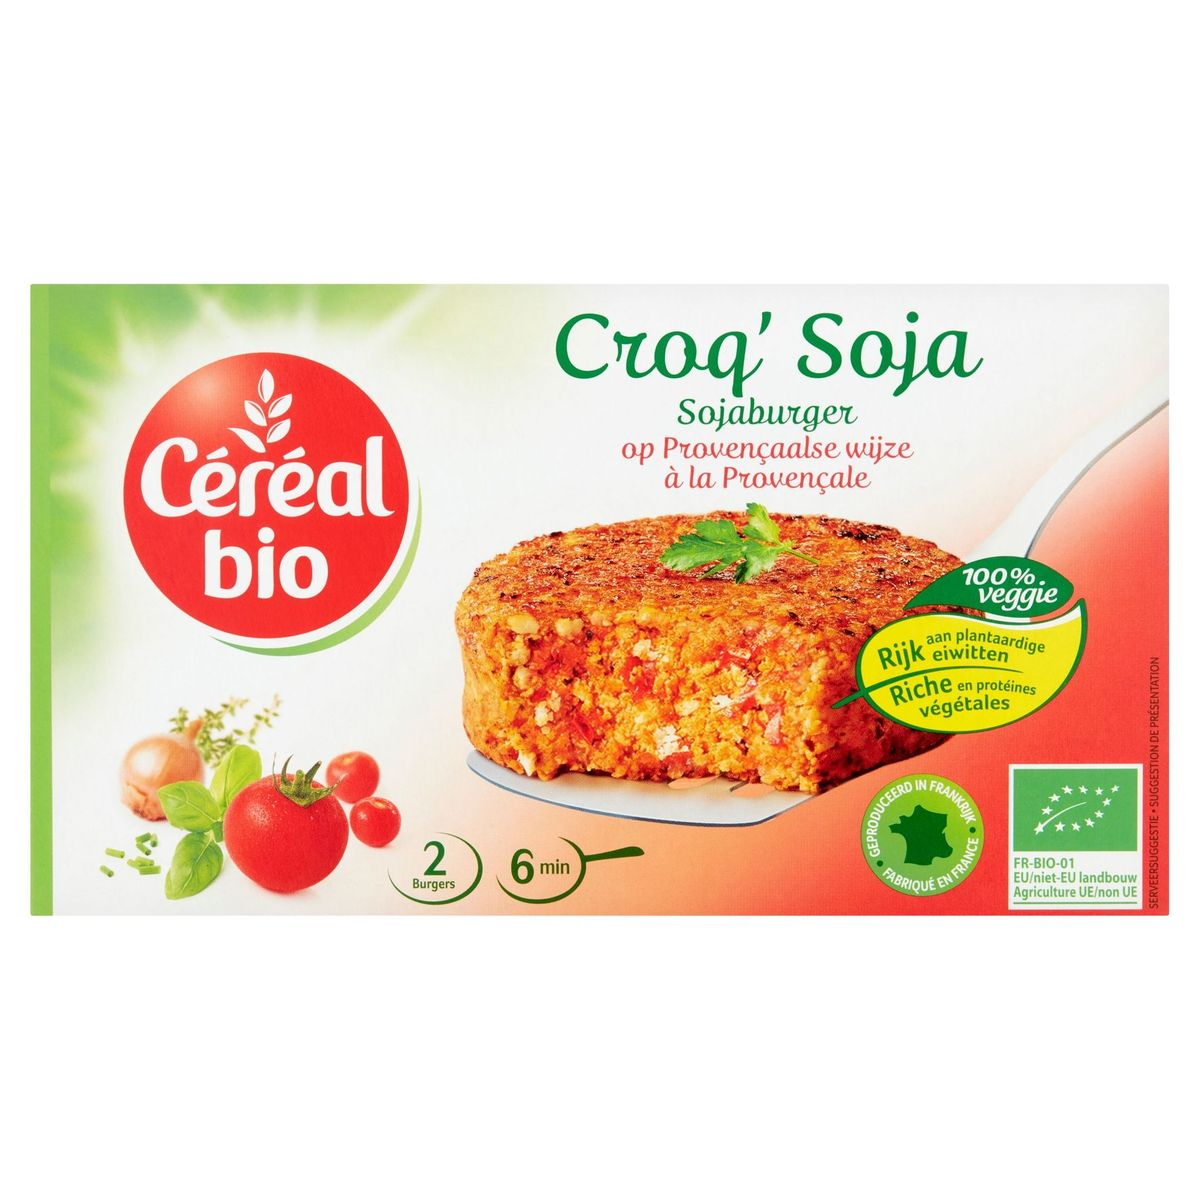 Céréal Bio Croq' Soja à la Provençale 2 x 100 g